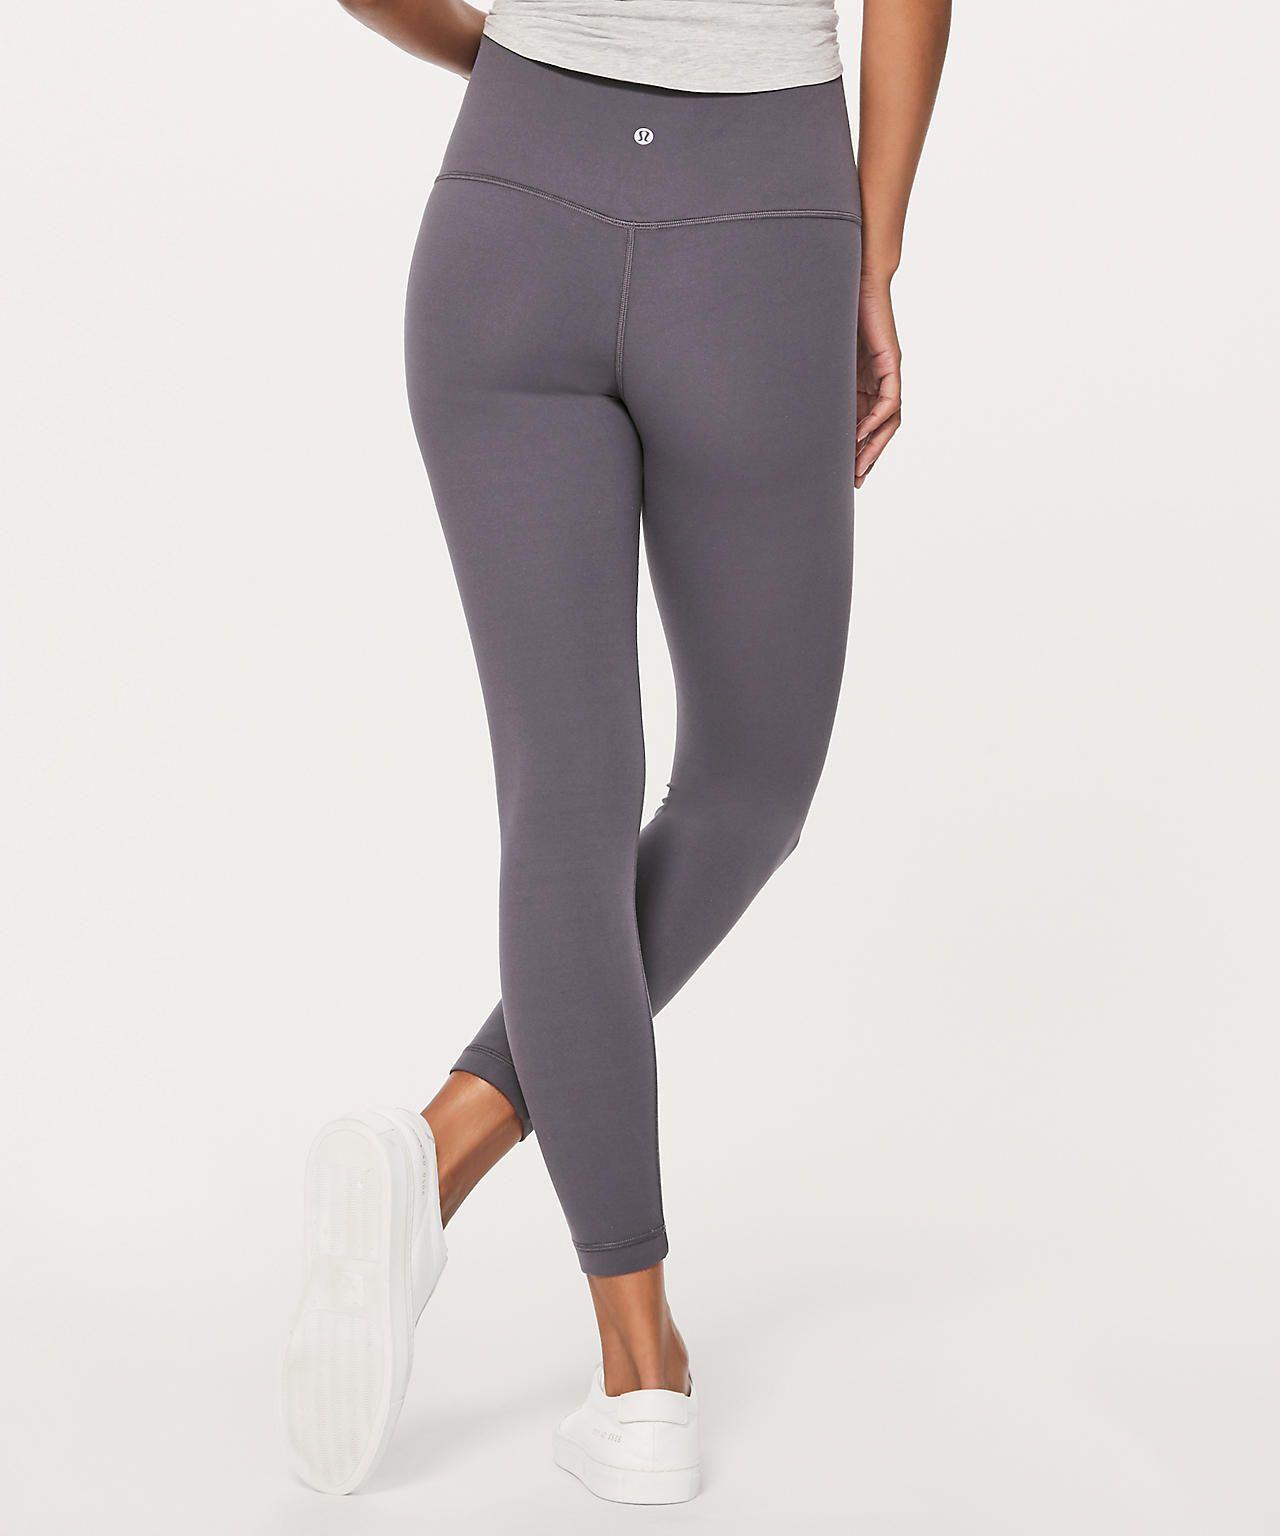 e291442b91732a Lululemon Align Pant II color dark shadow | style | Pants, Lululemon ...